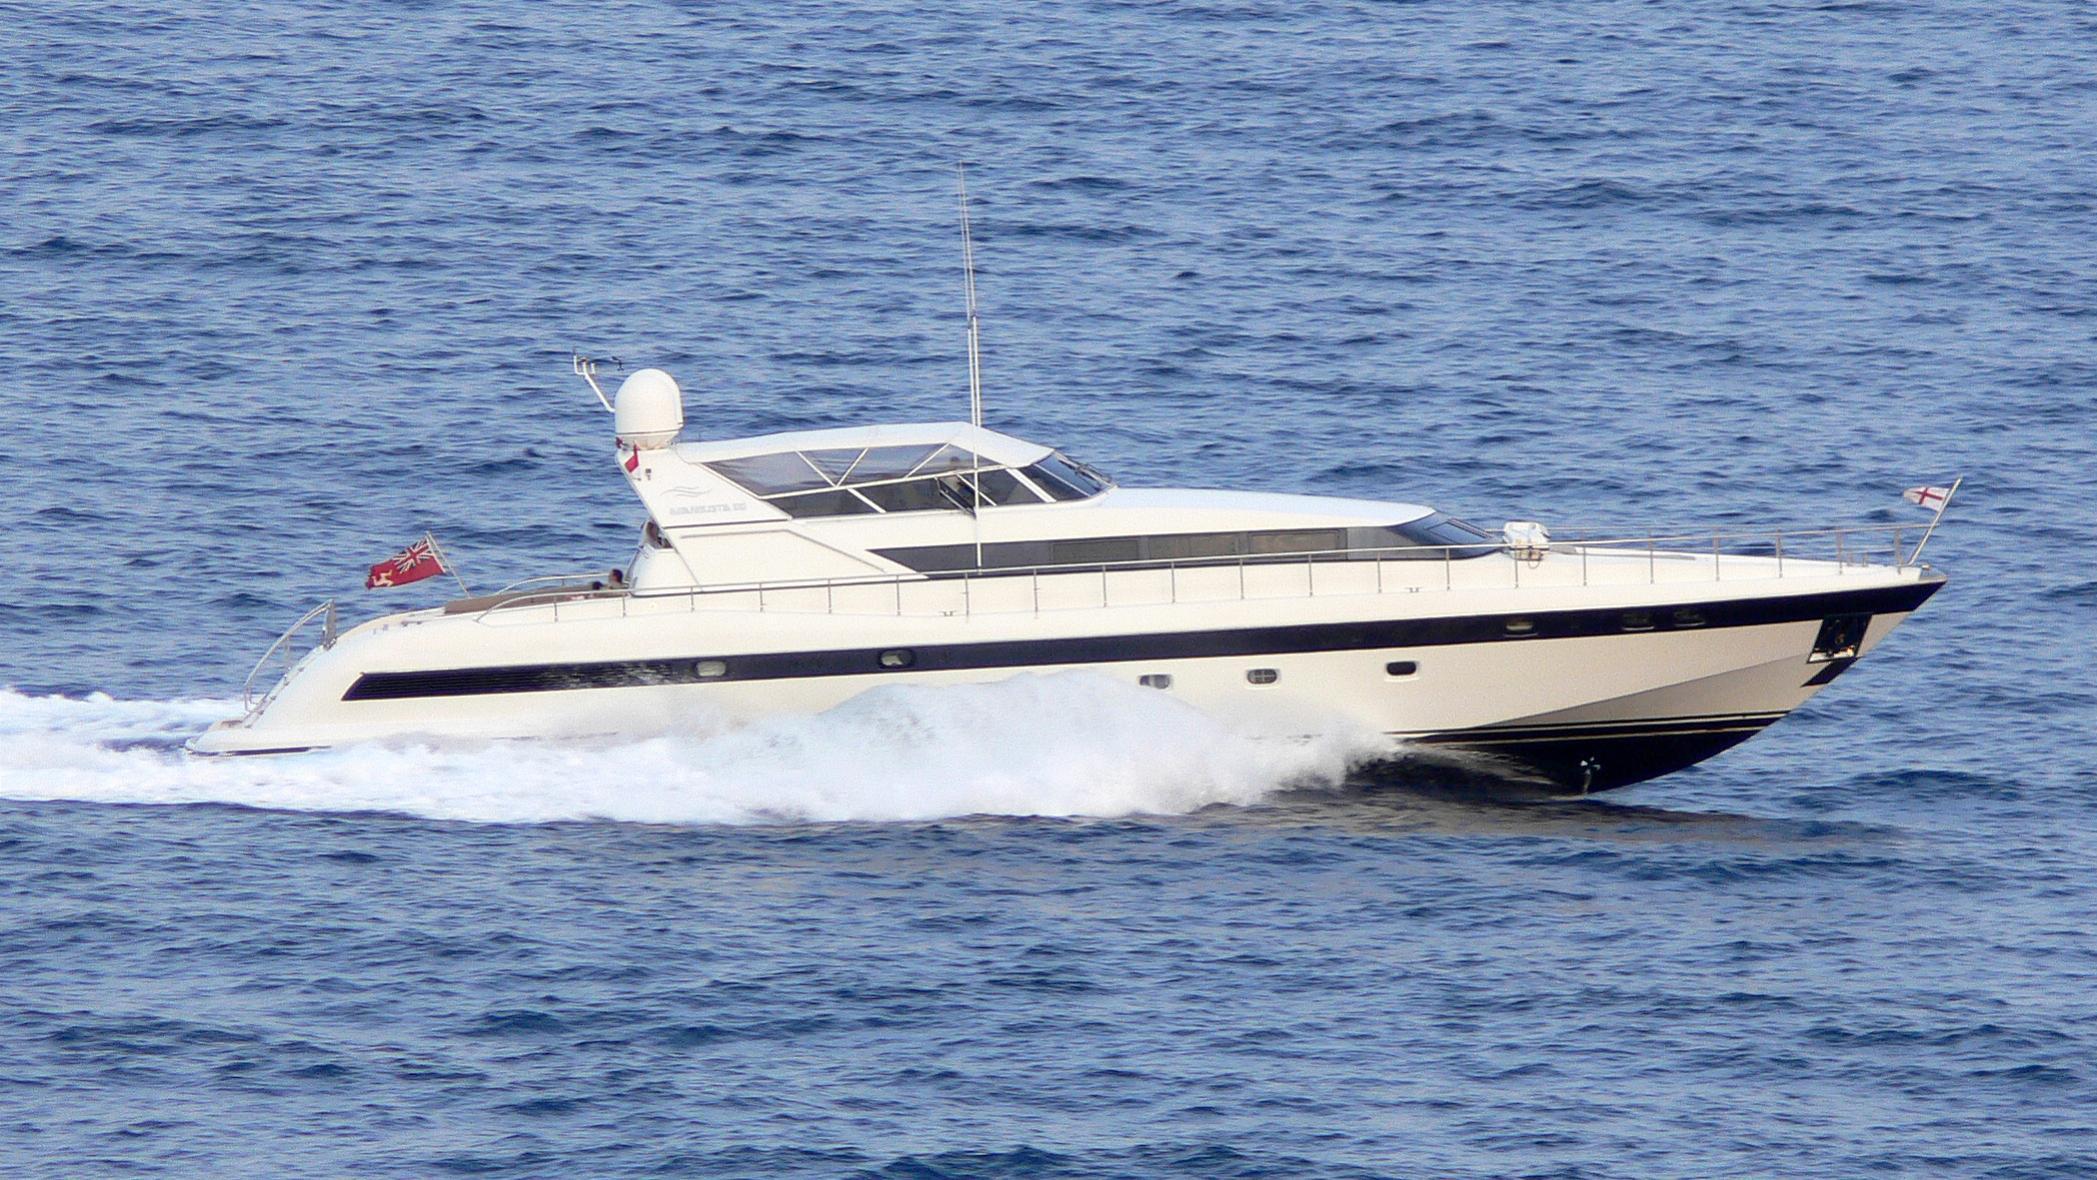 equilibrium motoryacht overmarine mangusta 100 1996 30m running profile